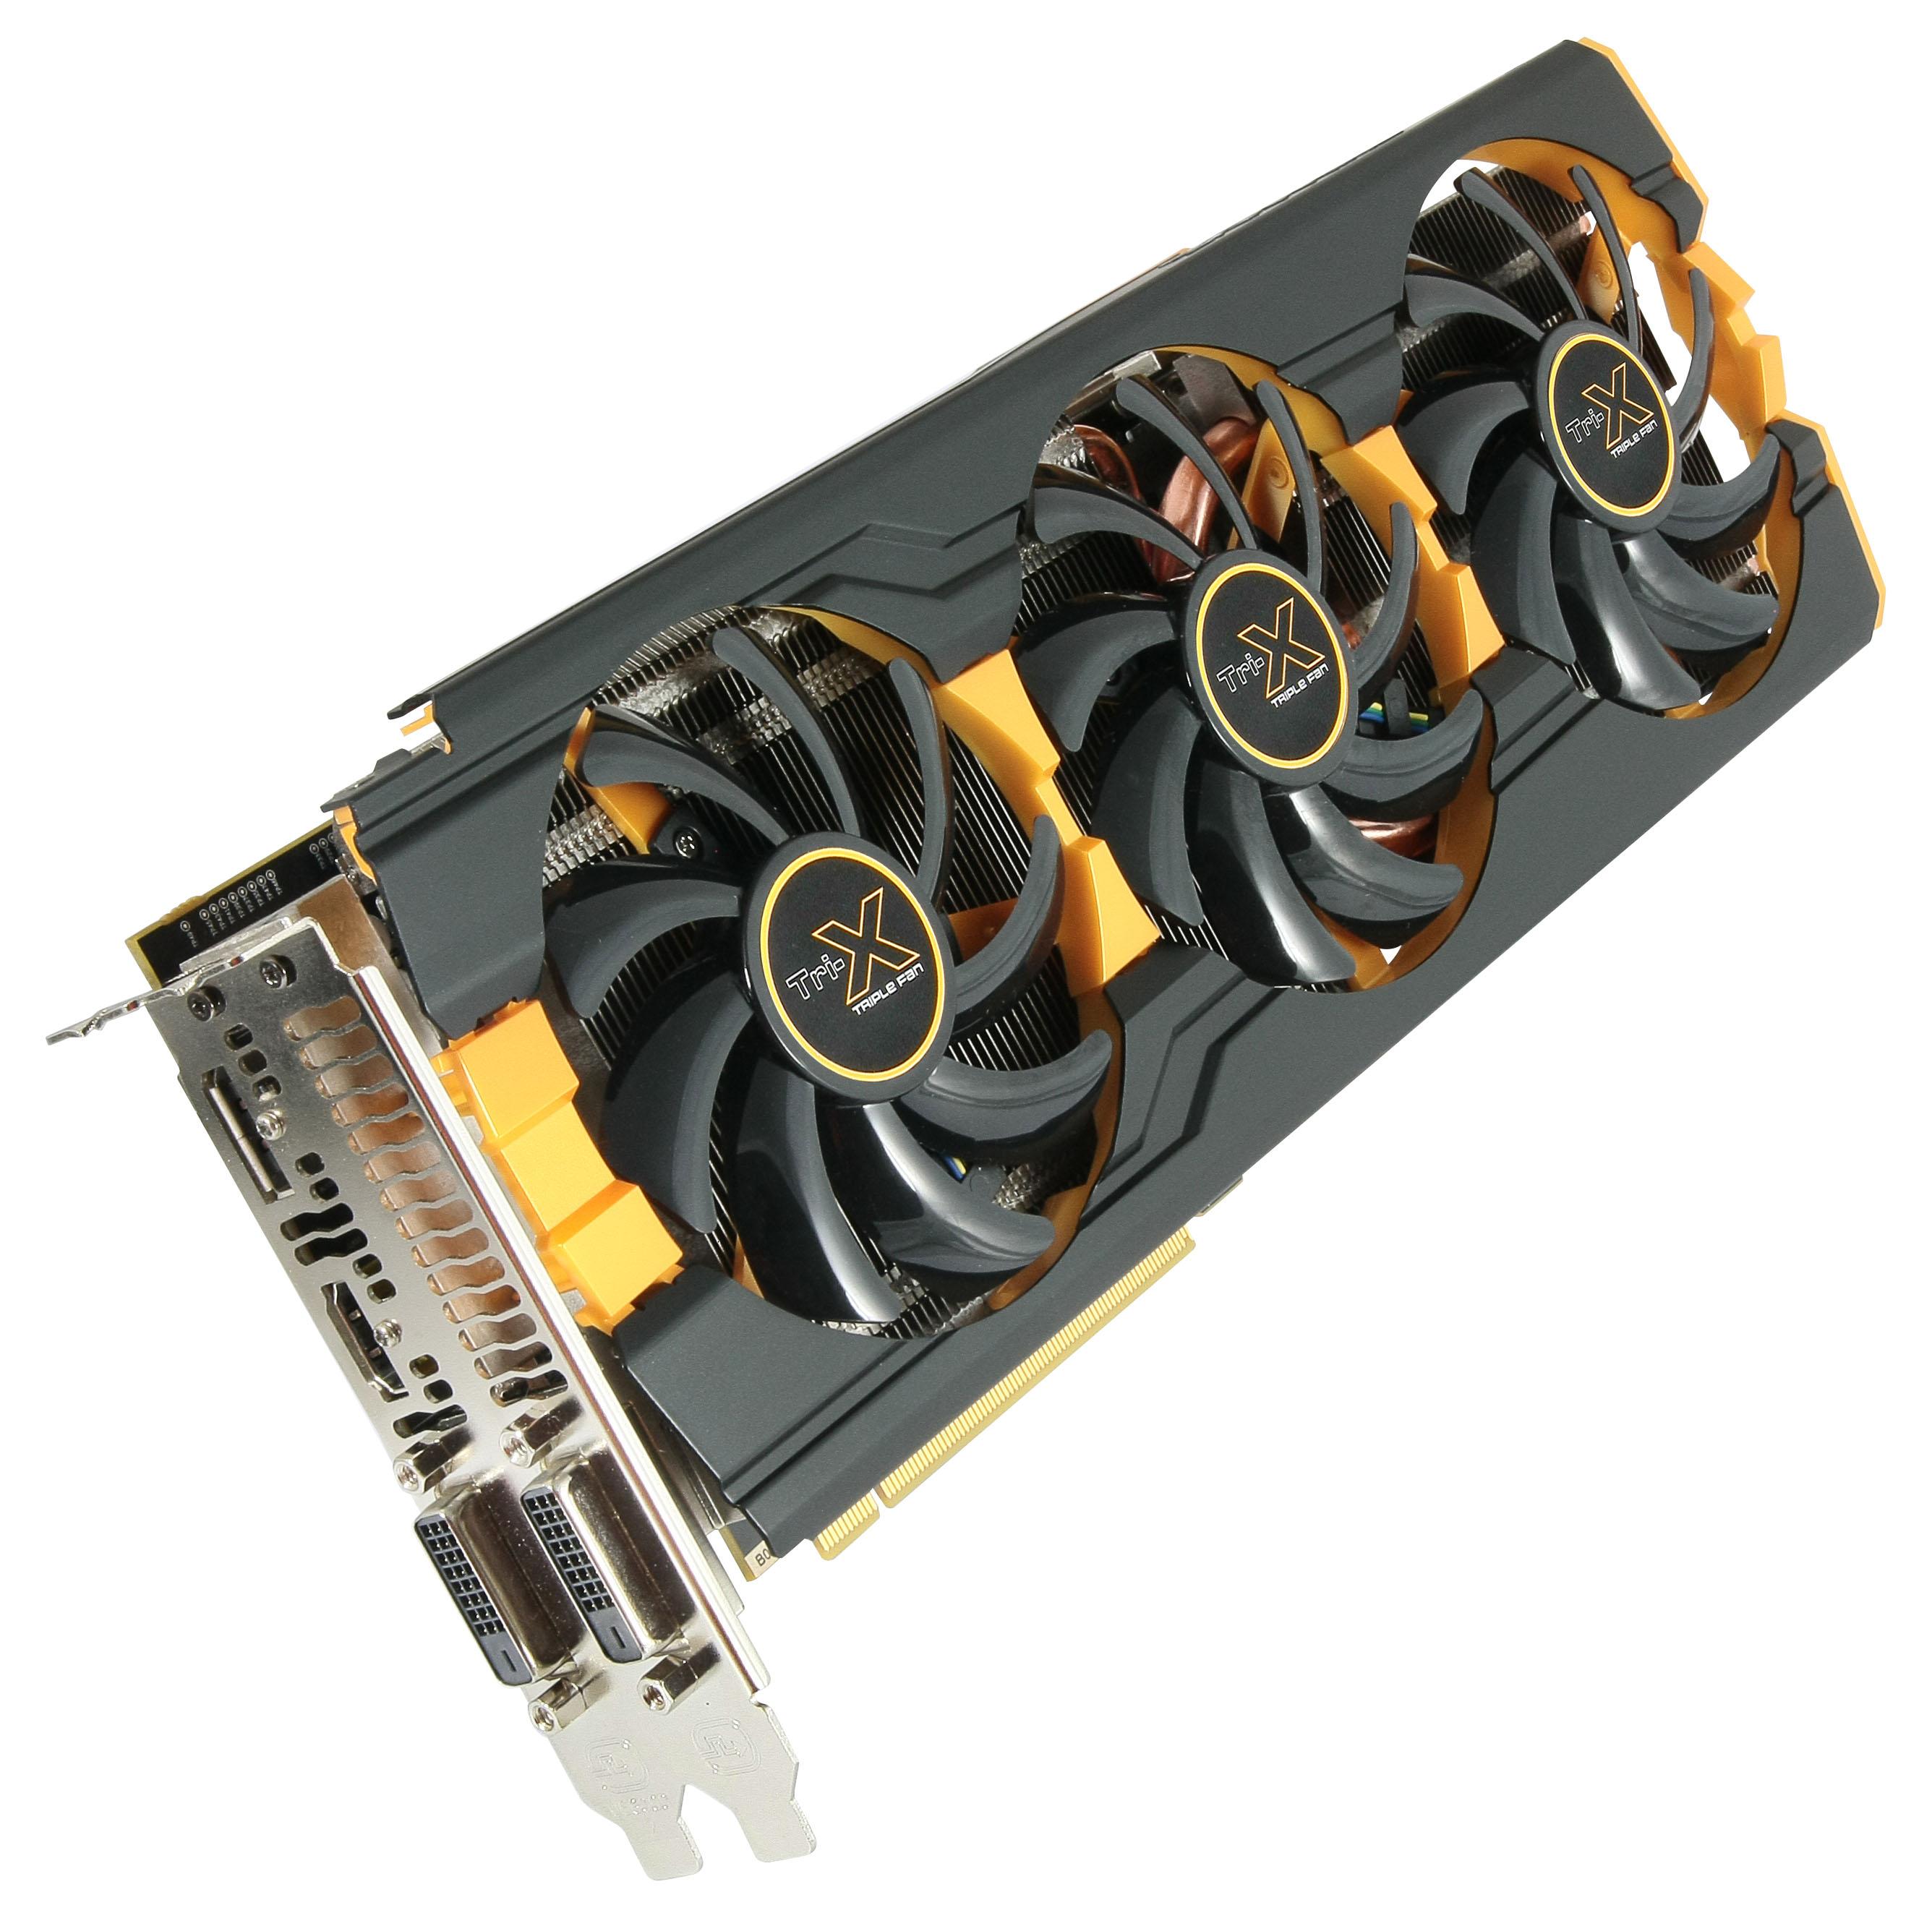 r9 290 4gb mining